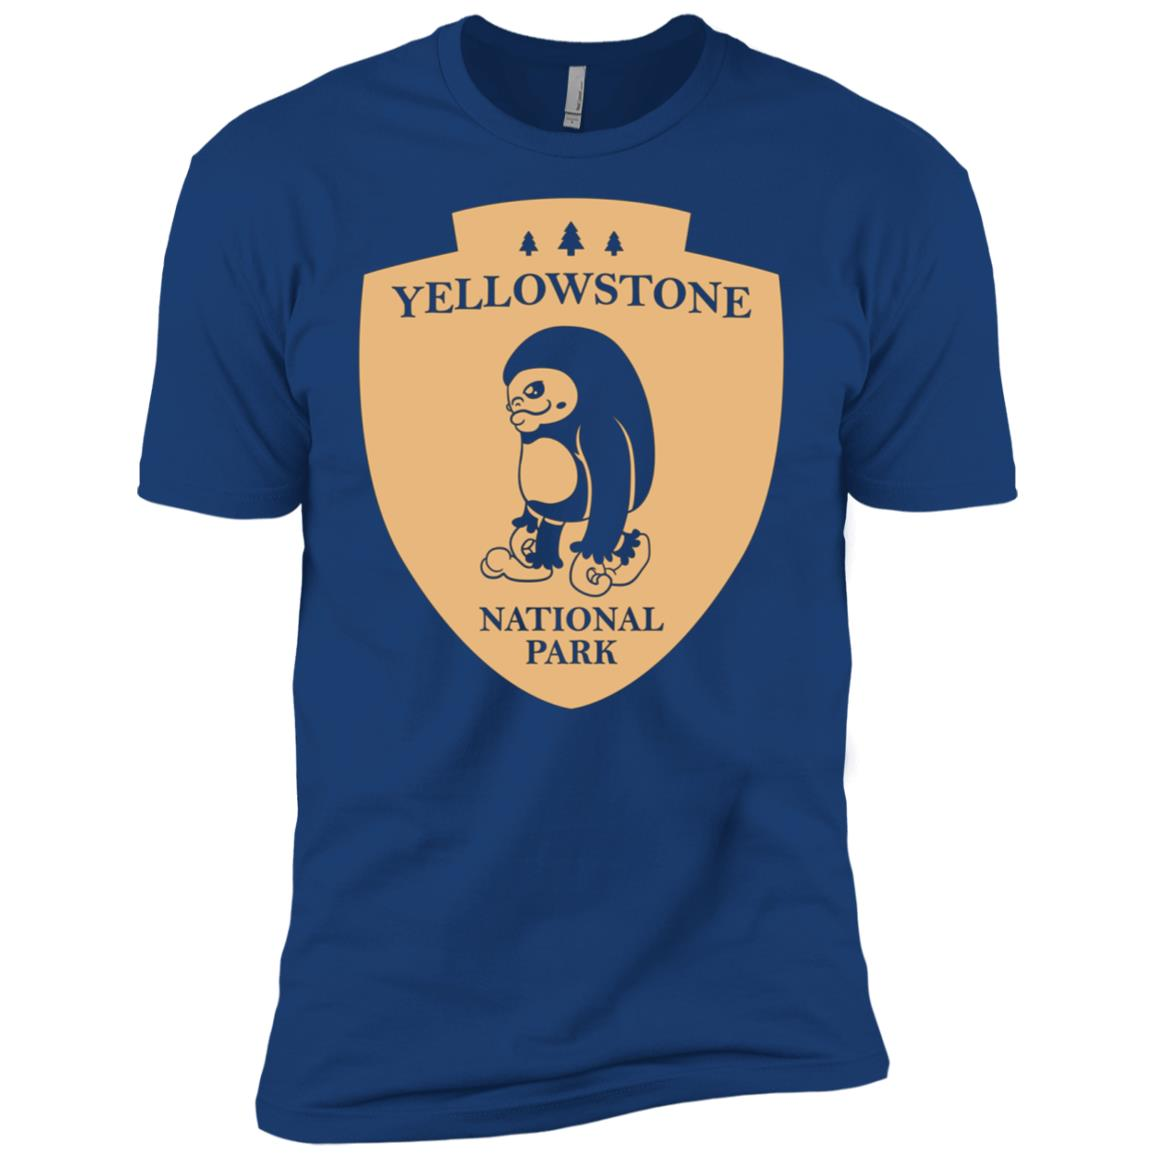 Yellowstone National Park Men Short Sleeve T-Shirt